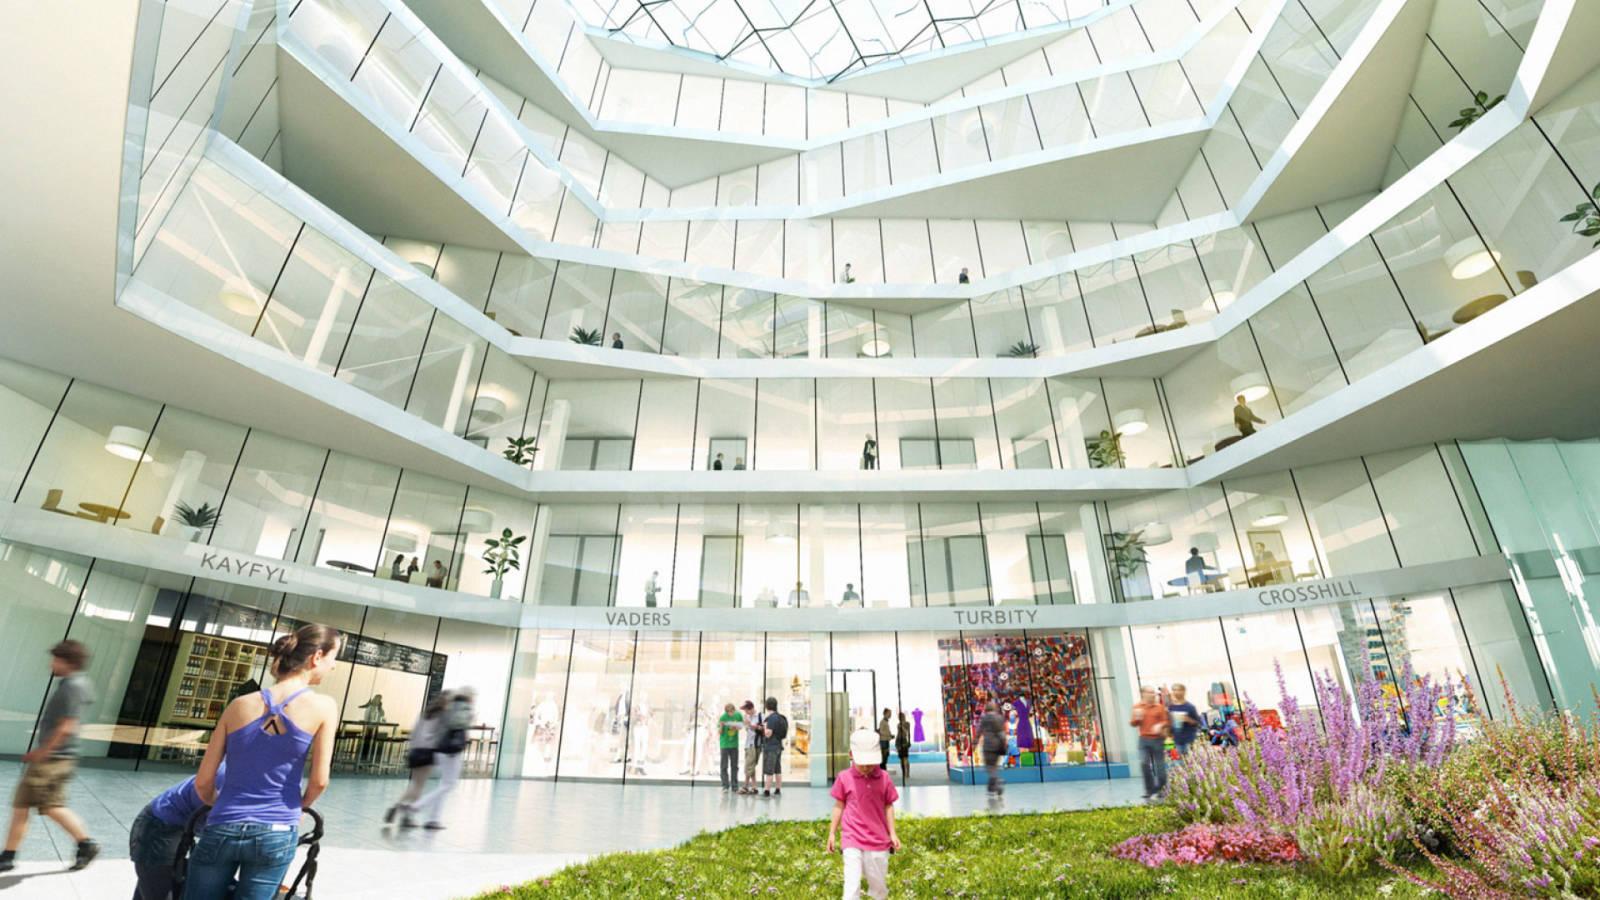 CLEAN CUT ATRIUM - Aker Brygge Masterplan - SPOL Architects